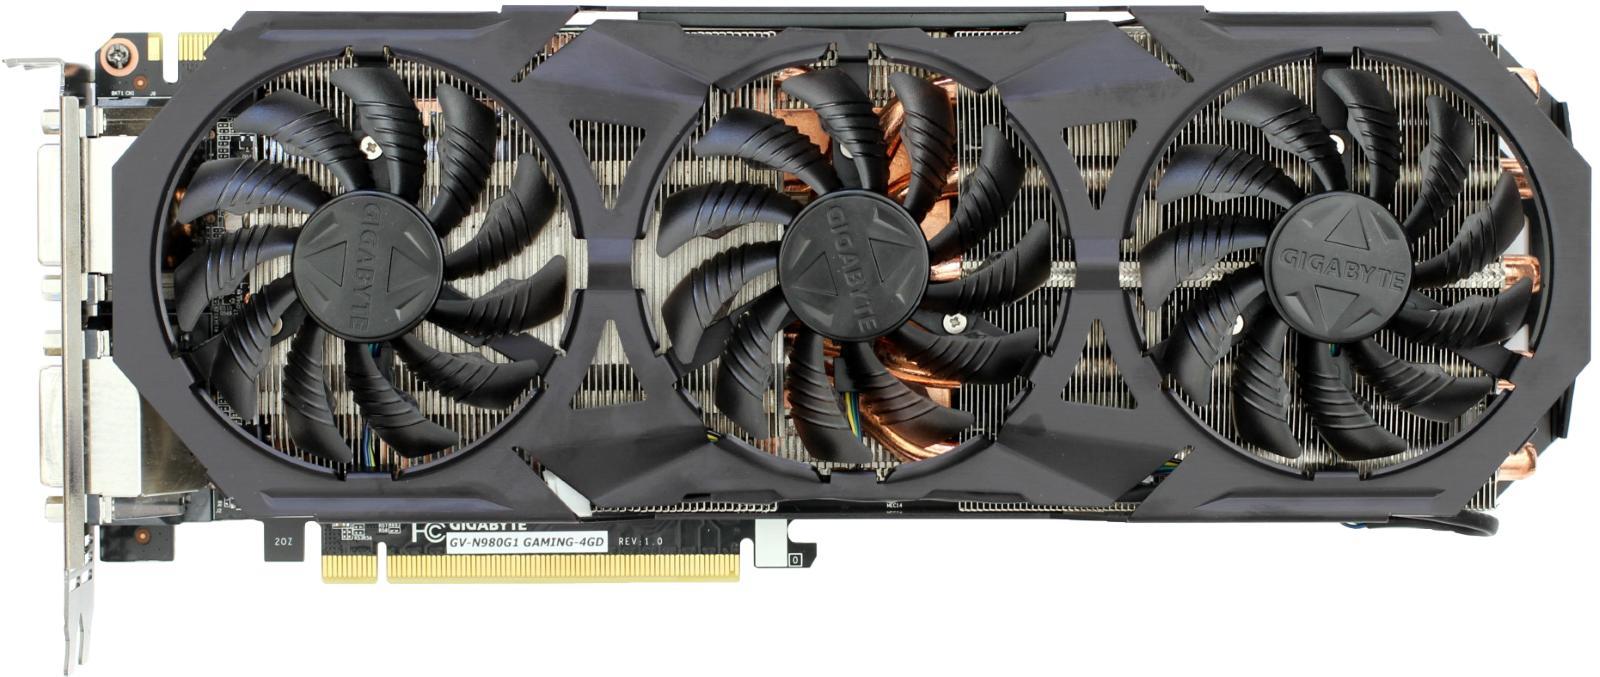 Gigabyte GeForce GTX 960 G1 Gaming